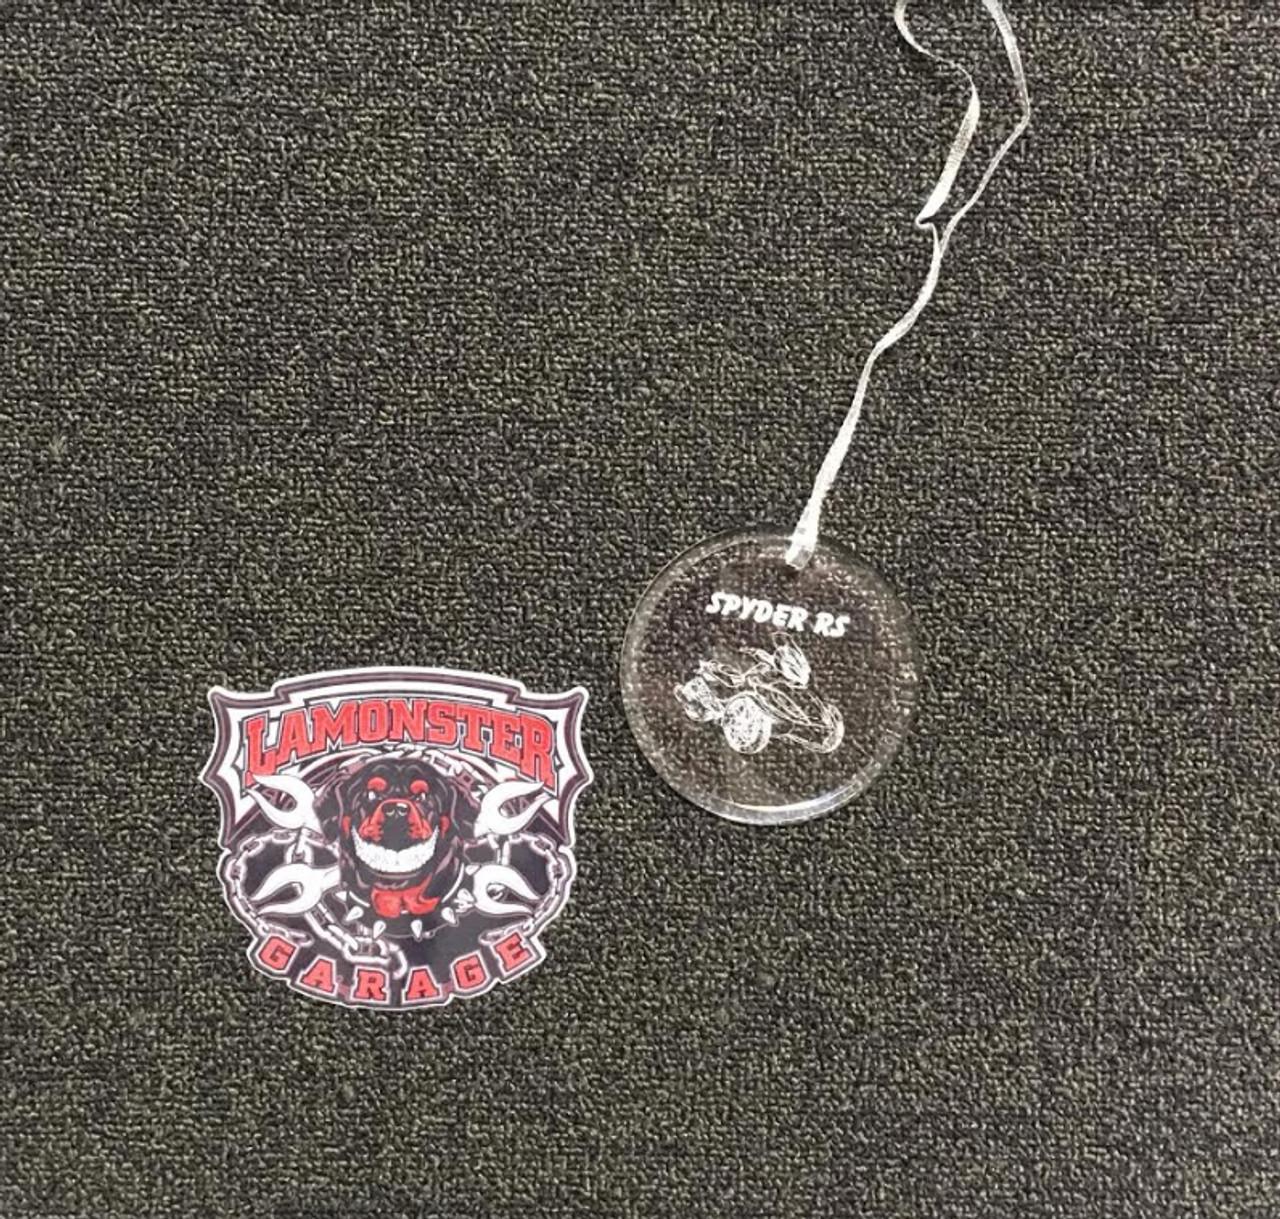 Spyder RS Ornament